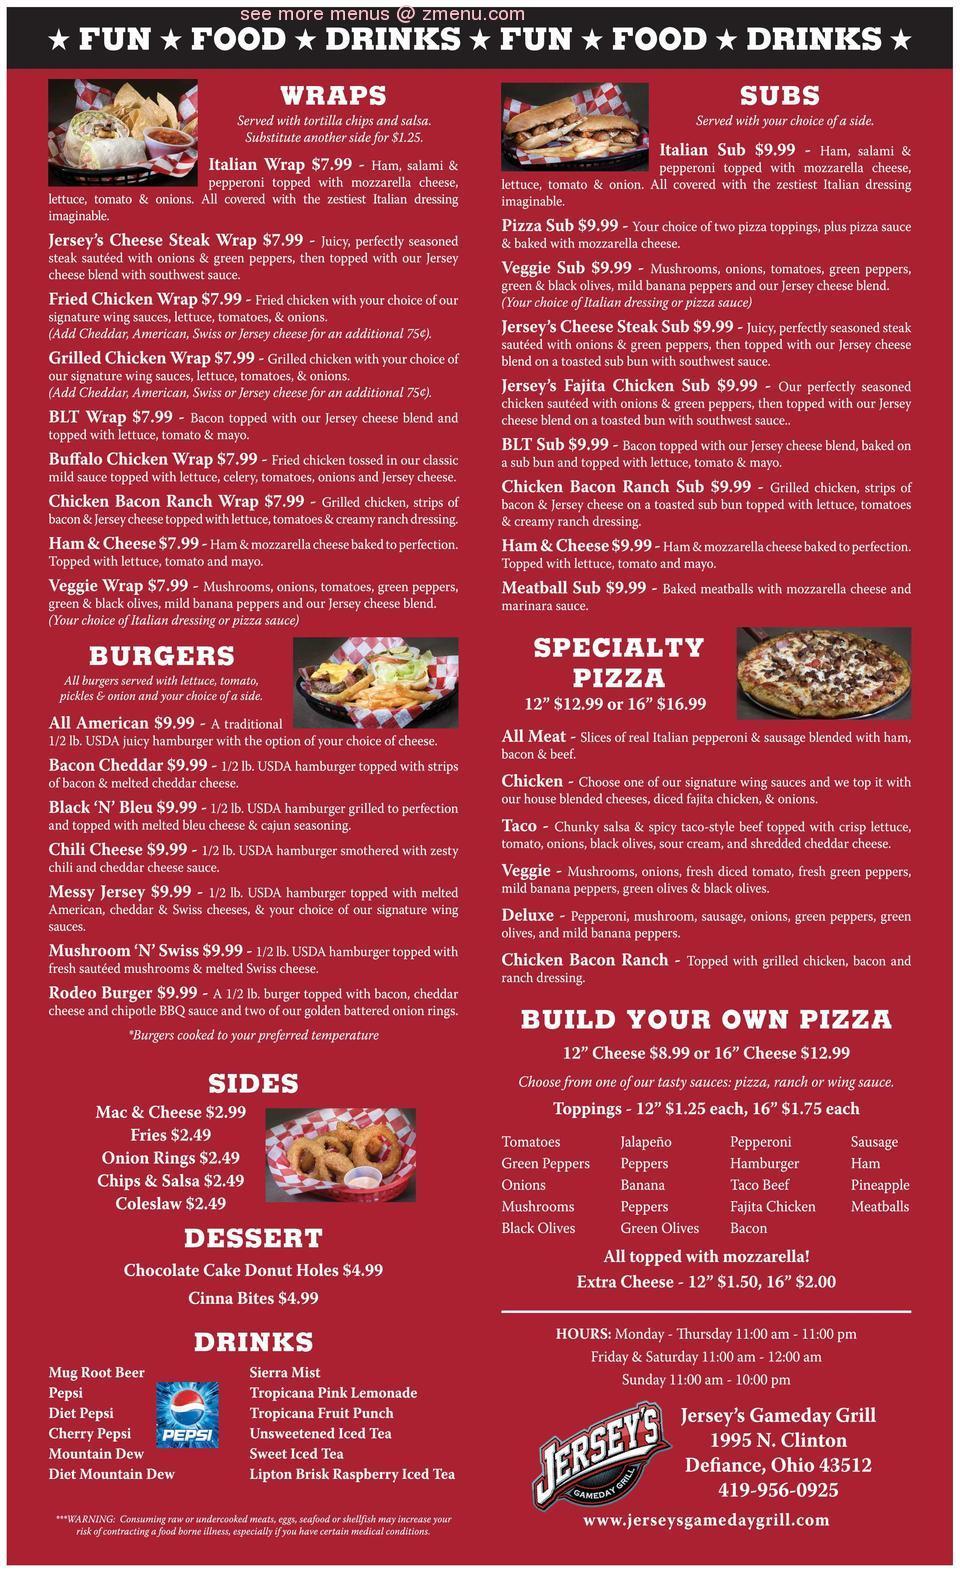 Online Menu of Jerseys Gameday Grill Restaurant, Defiance, Ohio ...